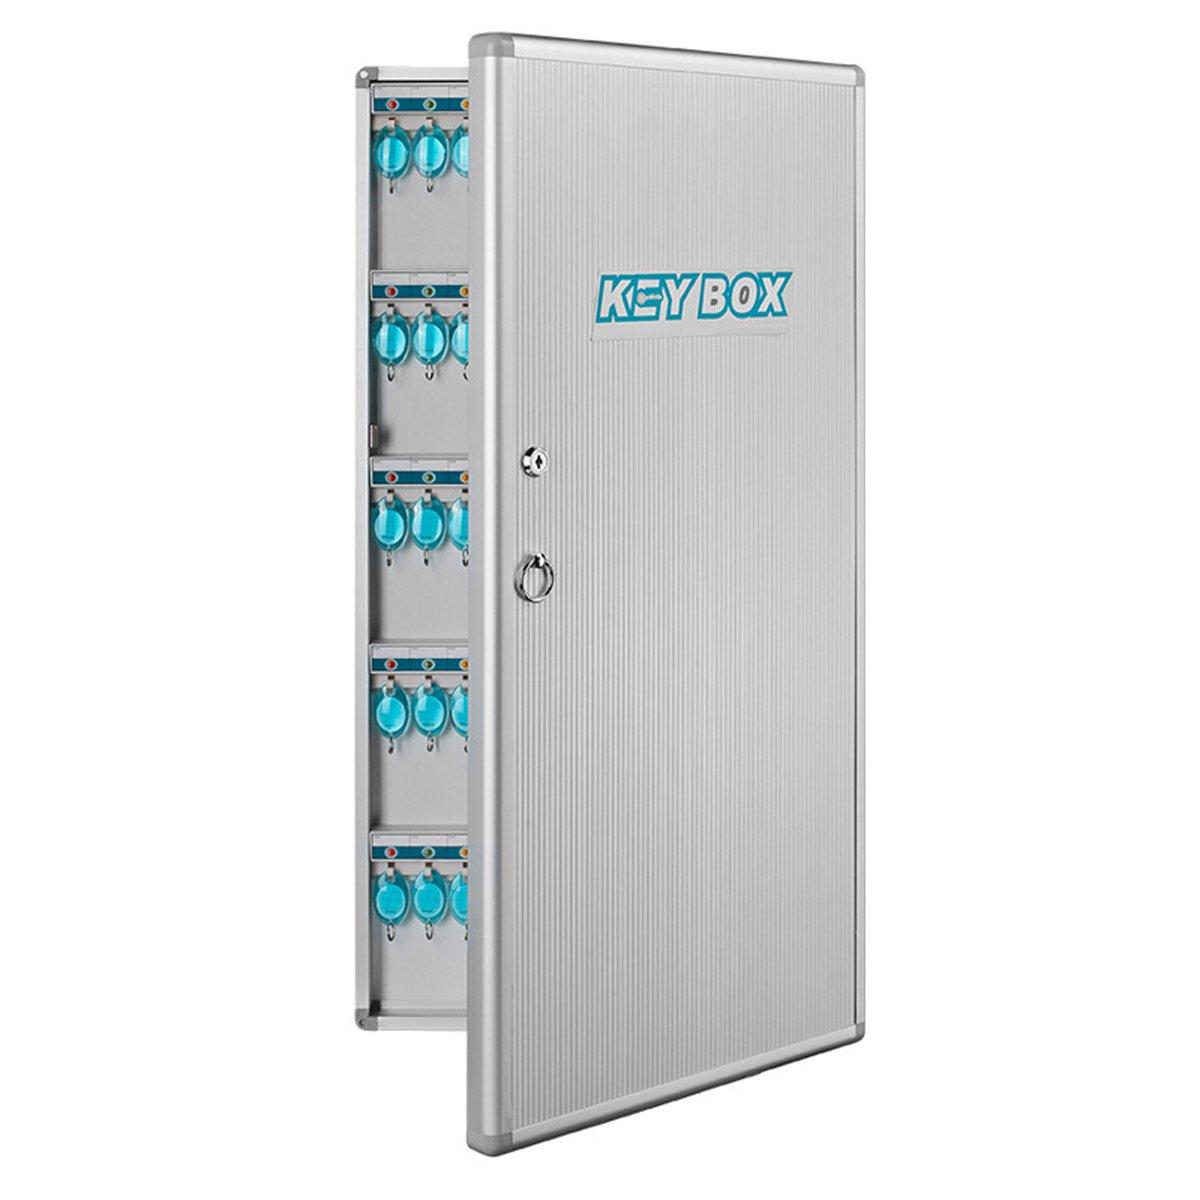 Popowbe 120 key management box aluminum key box key cabinet wall hanging